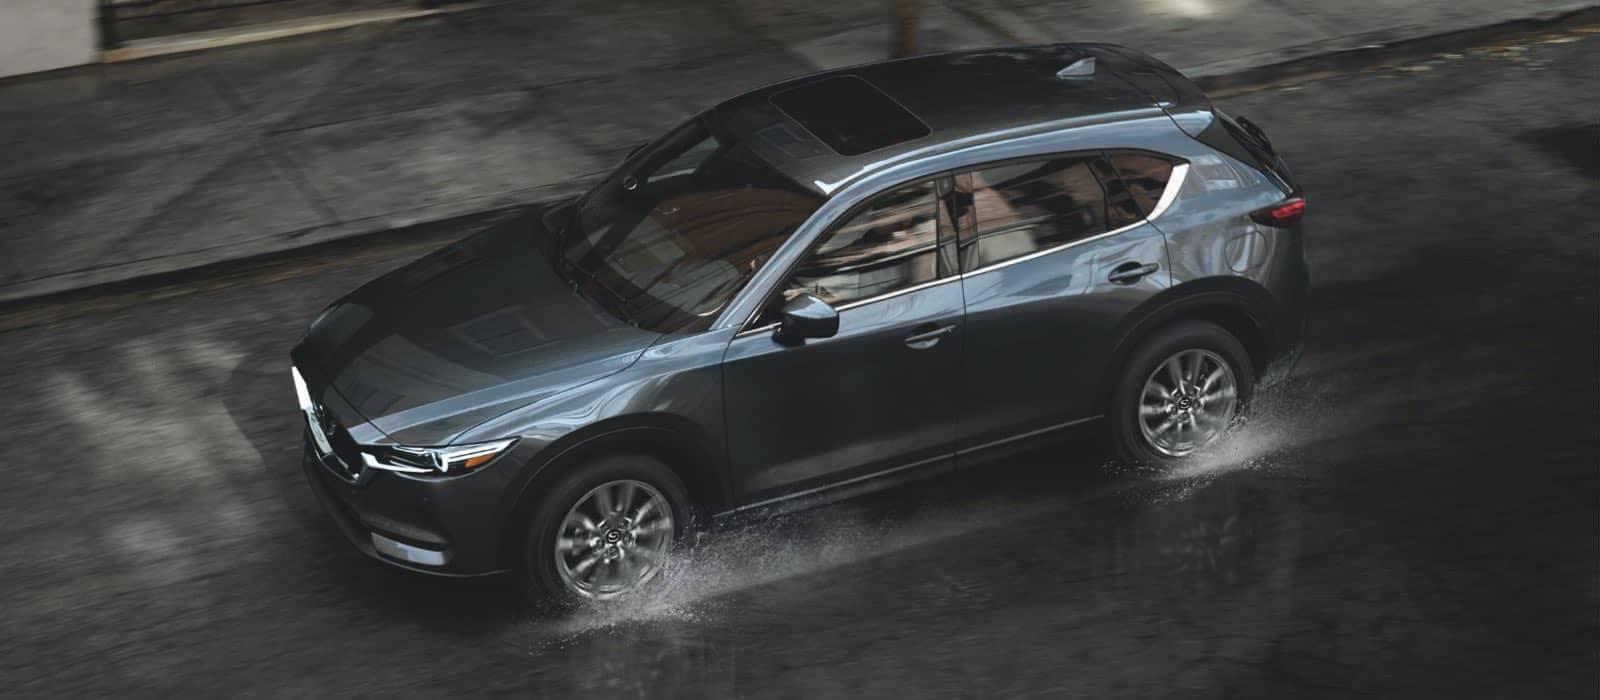 2021-Mazda-CX-5-splashing-in-puddles